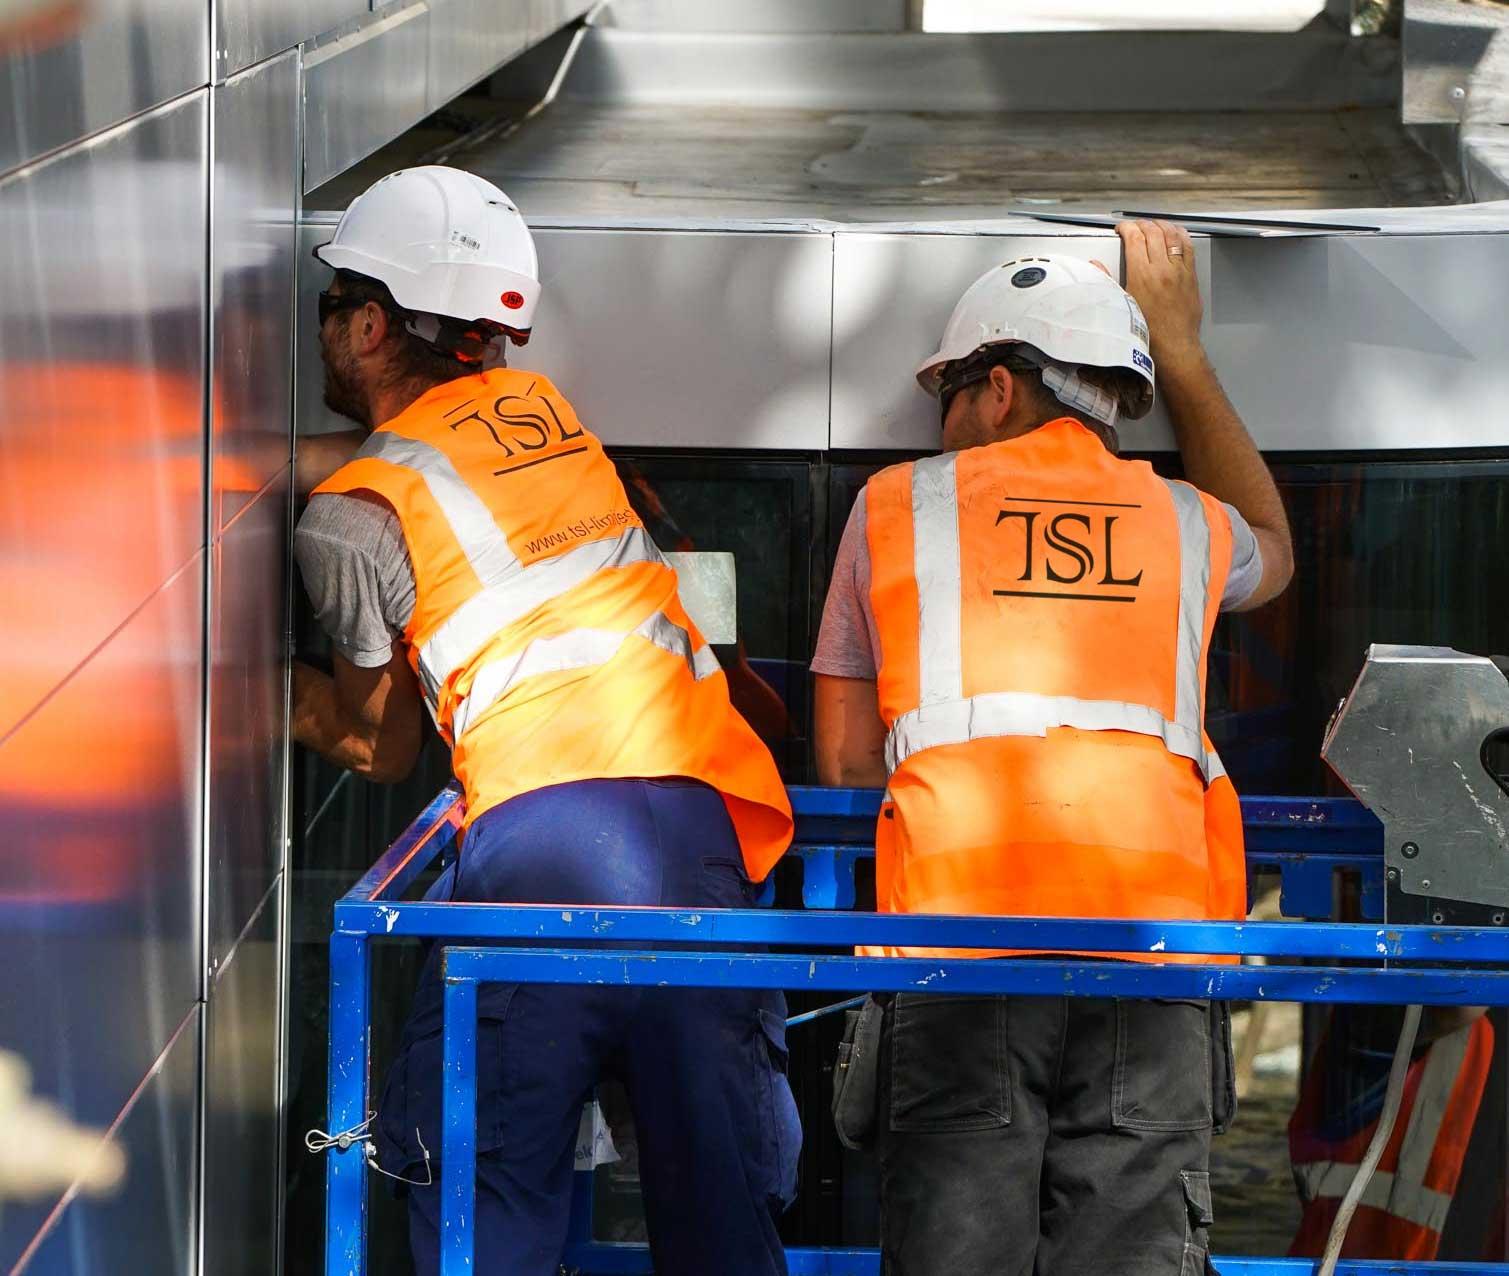 Radisson Hotel Heathrow TSL workers